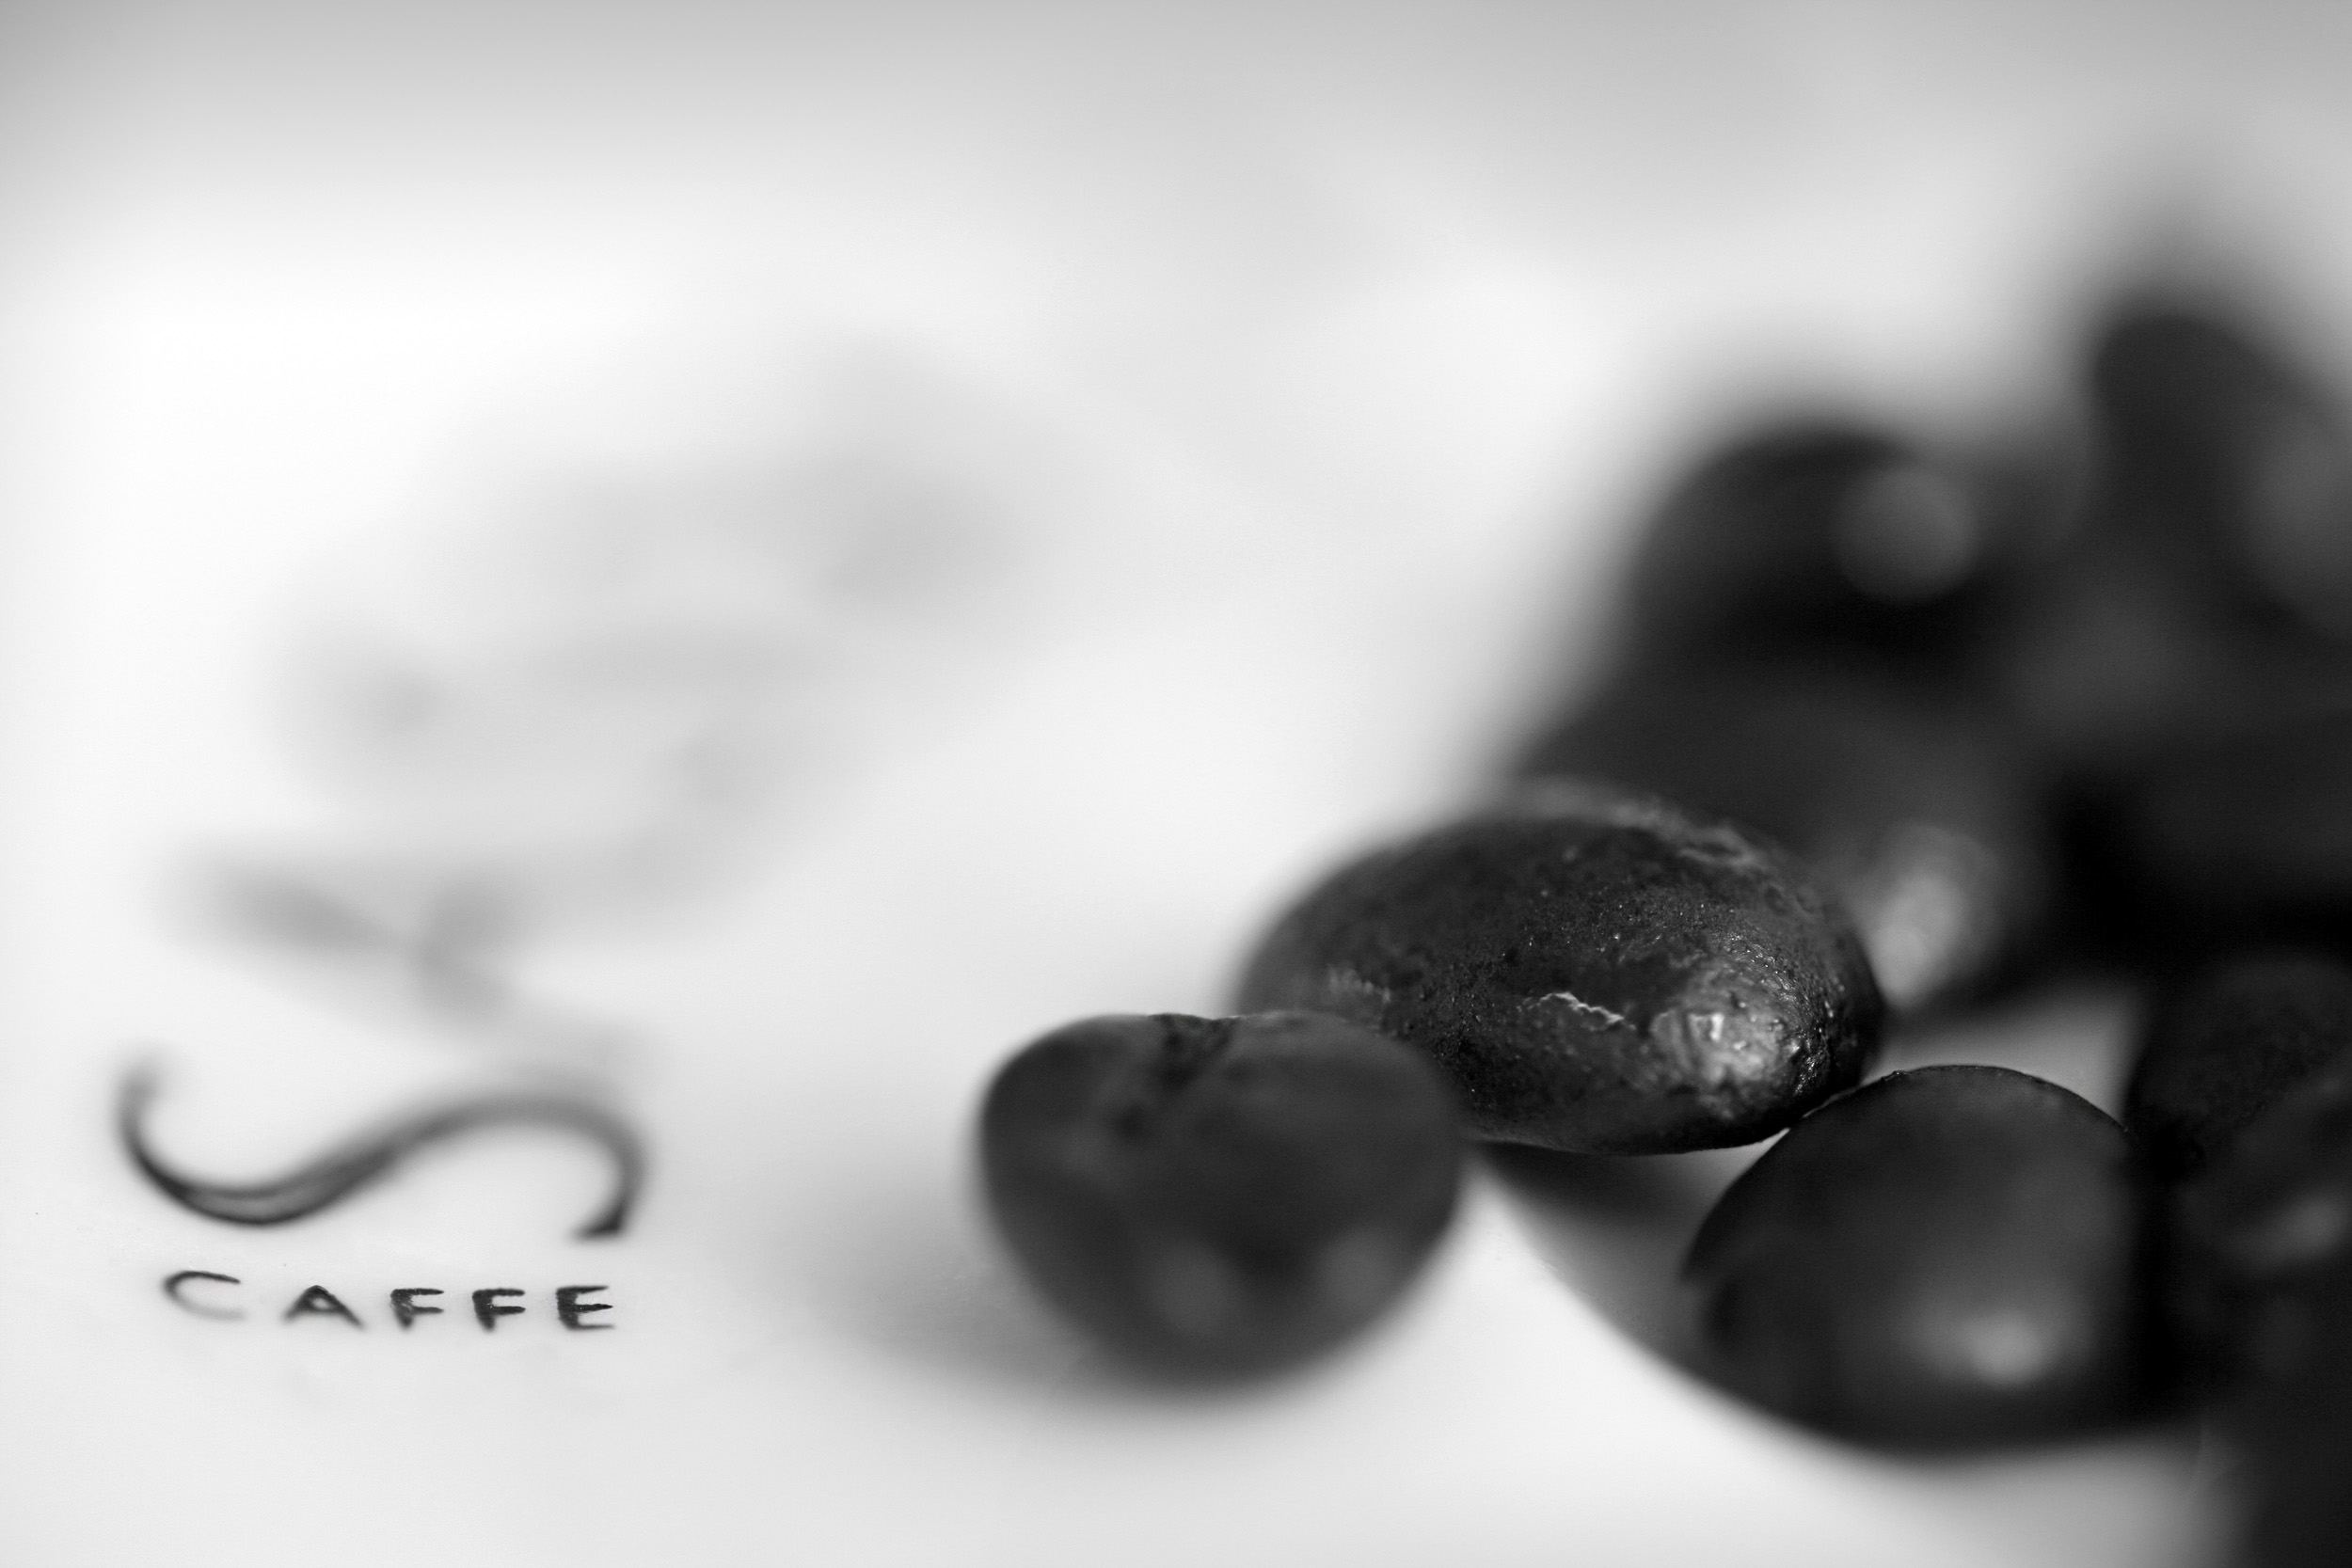 Coffee_17.JPG